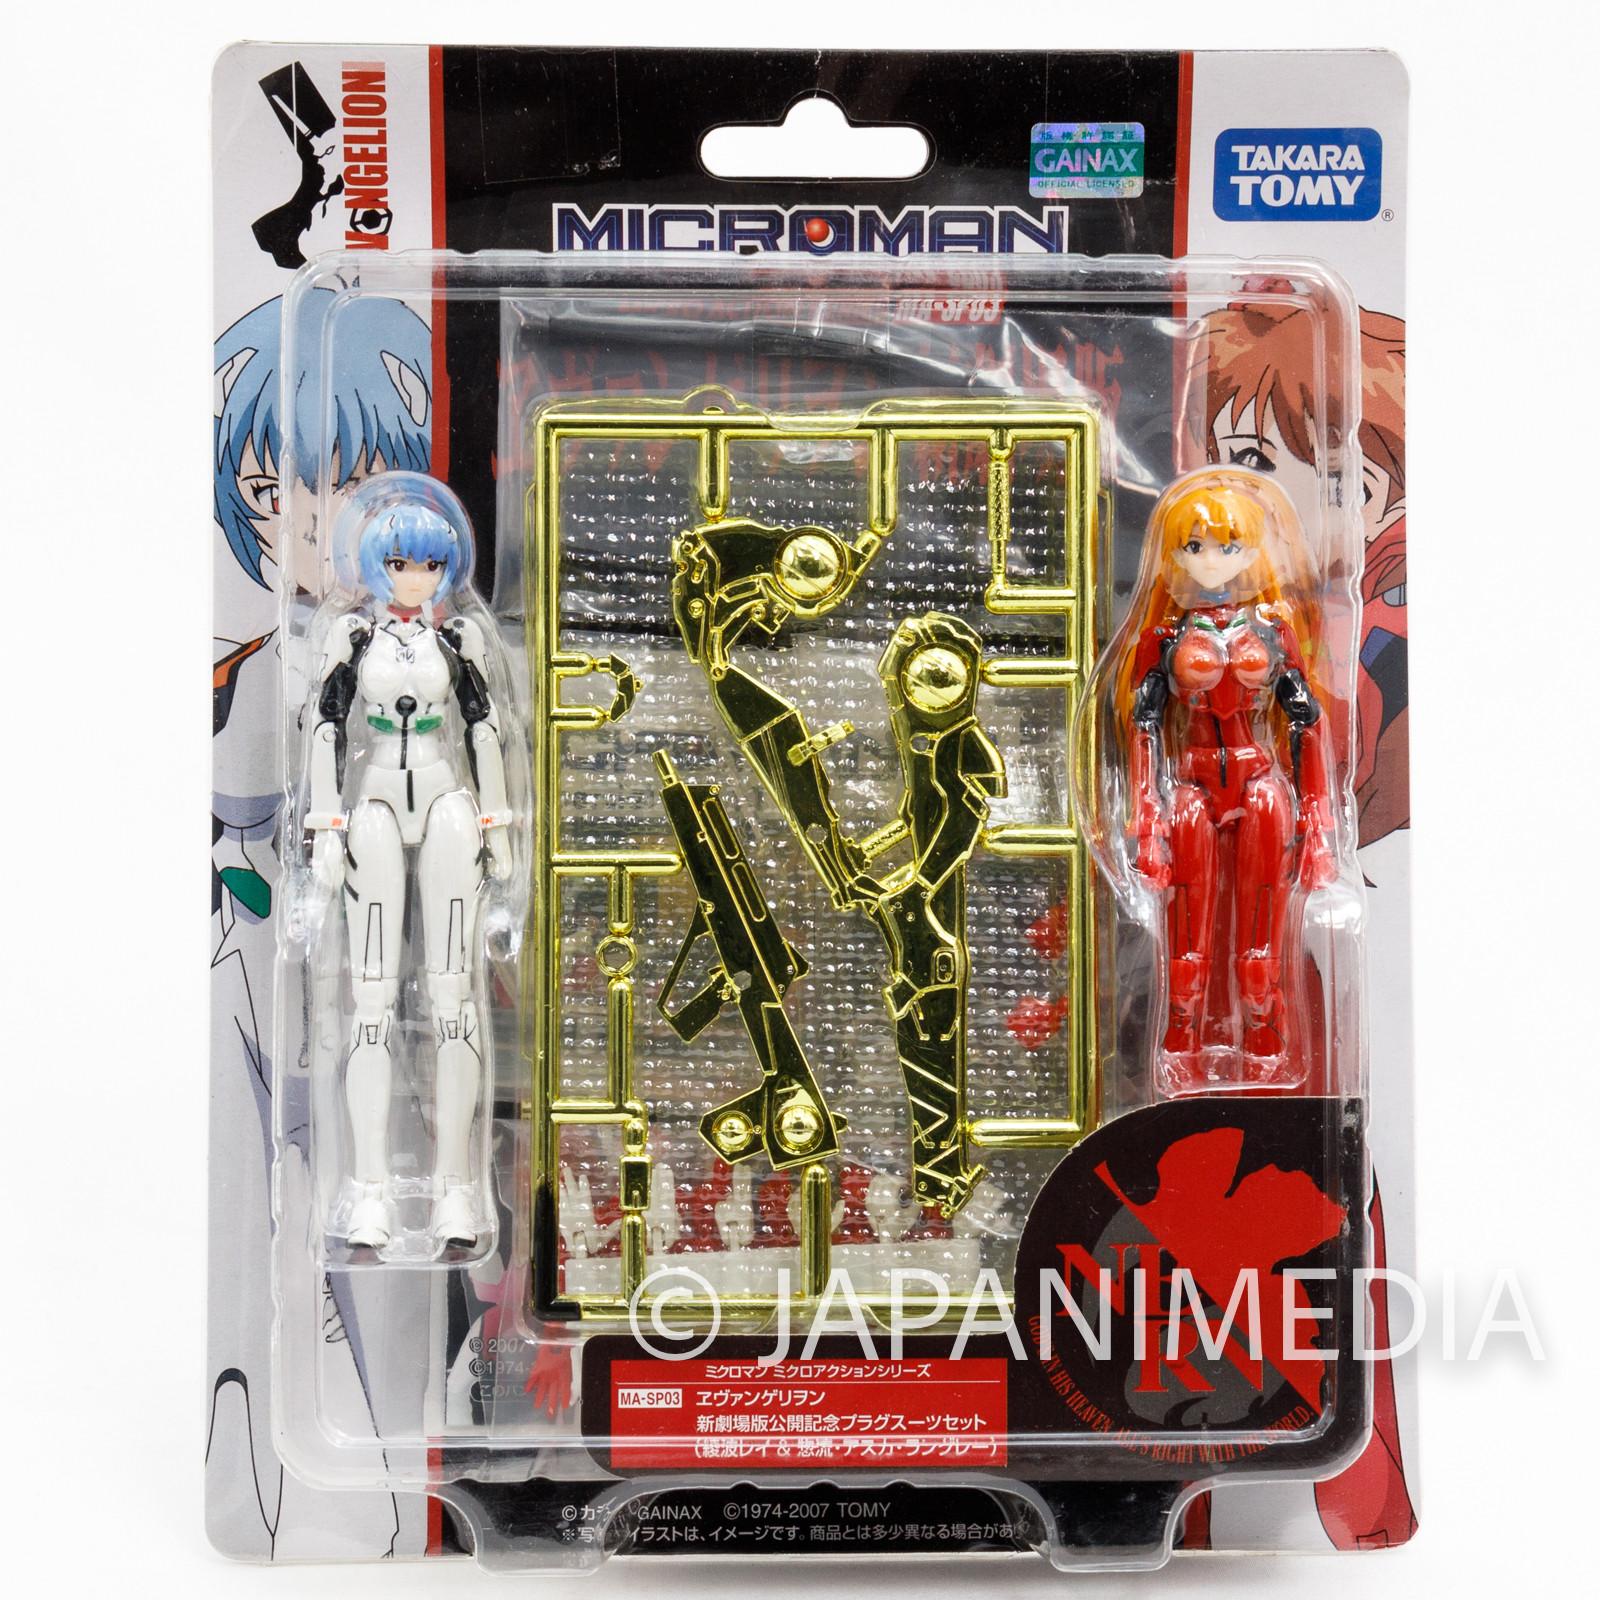 Evangelion Asuka Langley & Rei Ayanami Plug Suit Ver. Microman Figure TAKARA TOMY